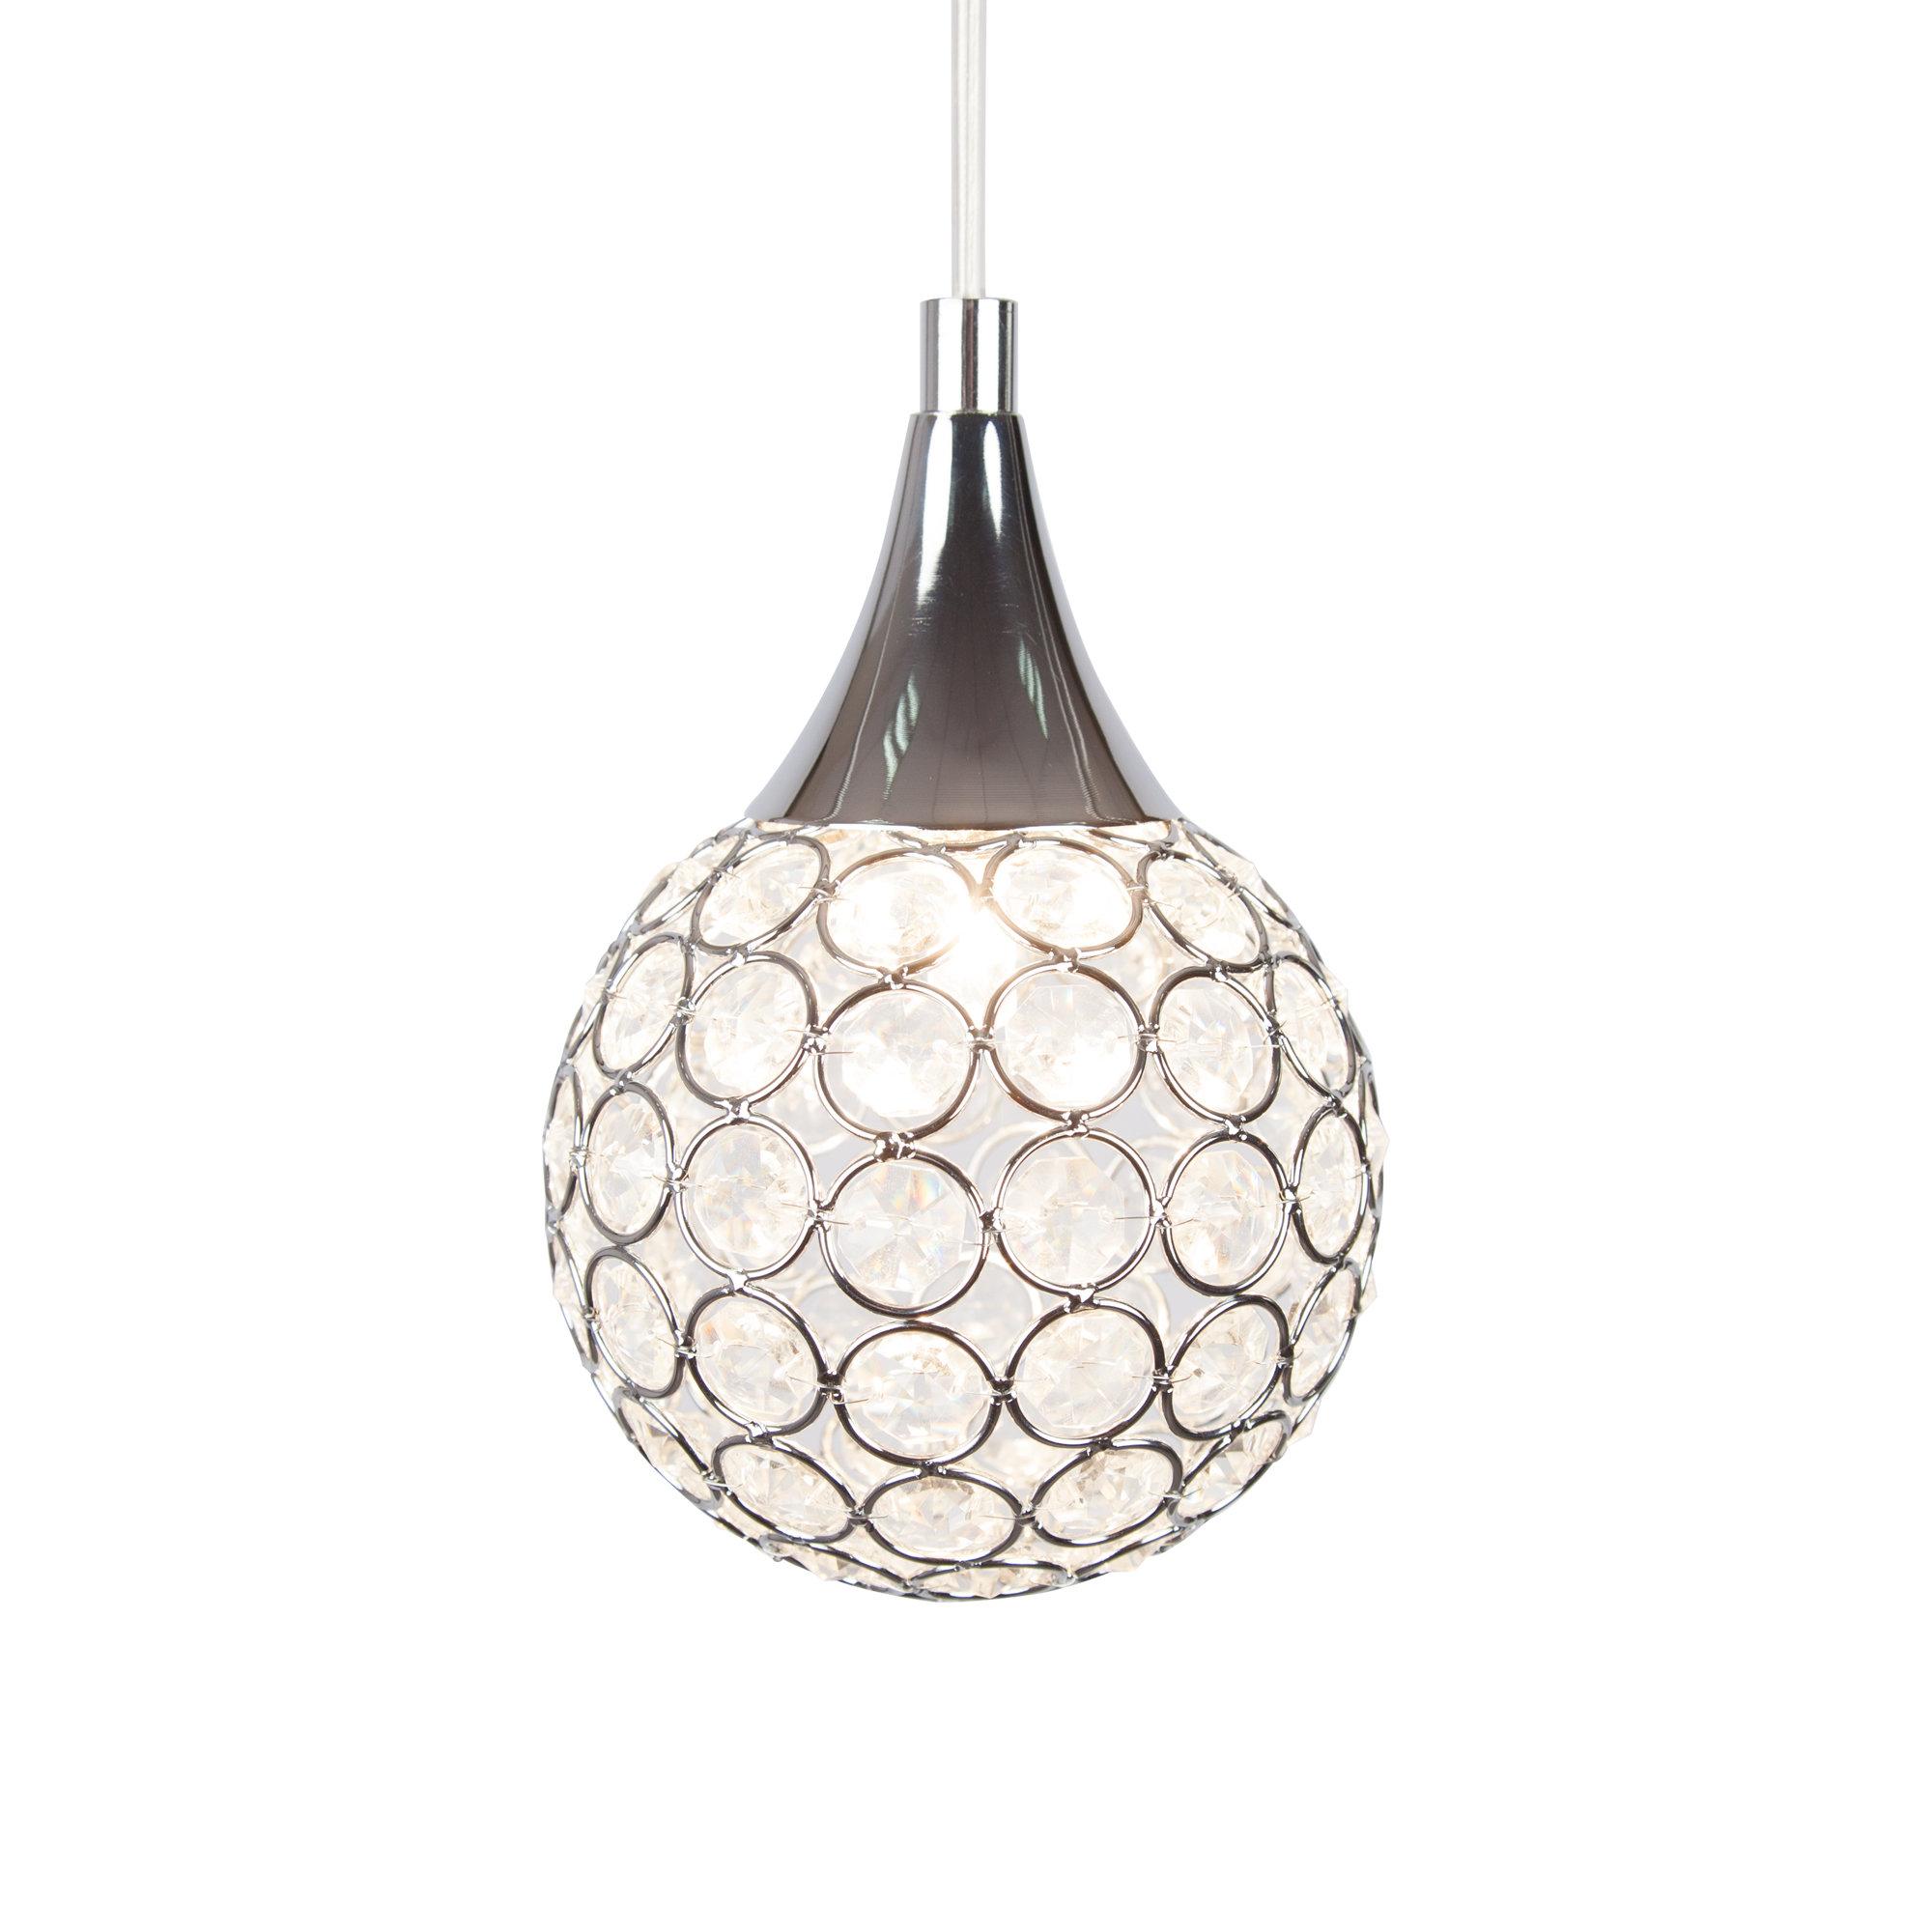 Thea 1 Light Led Globe Pendant Light With Regard To Preferred Devereaux 1 Light Single Globe Pendants (View 4 of 20)